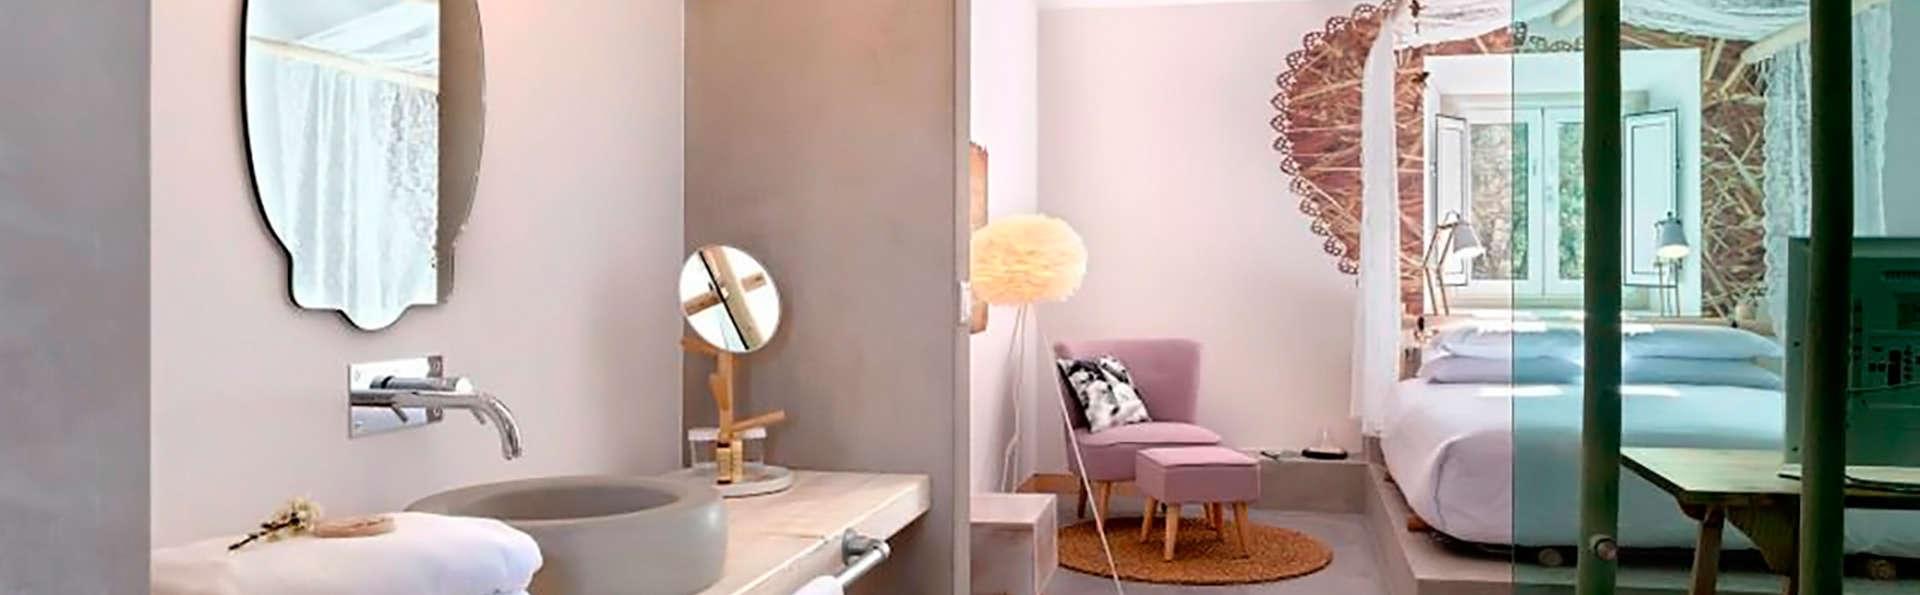 Hotel Luz Charming Houses - EDIT_superdeluxe3.jpg